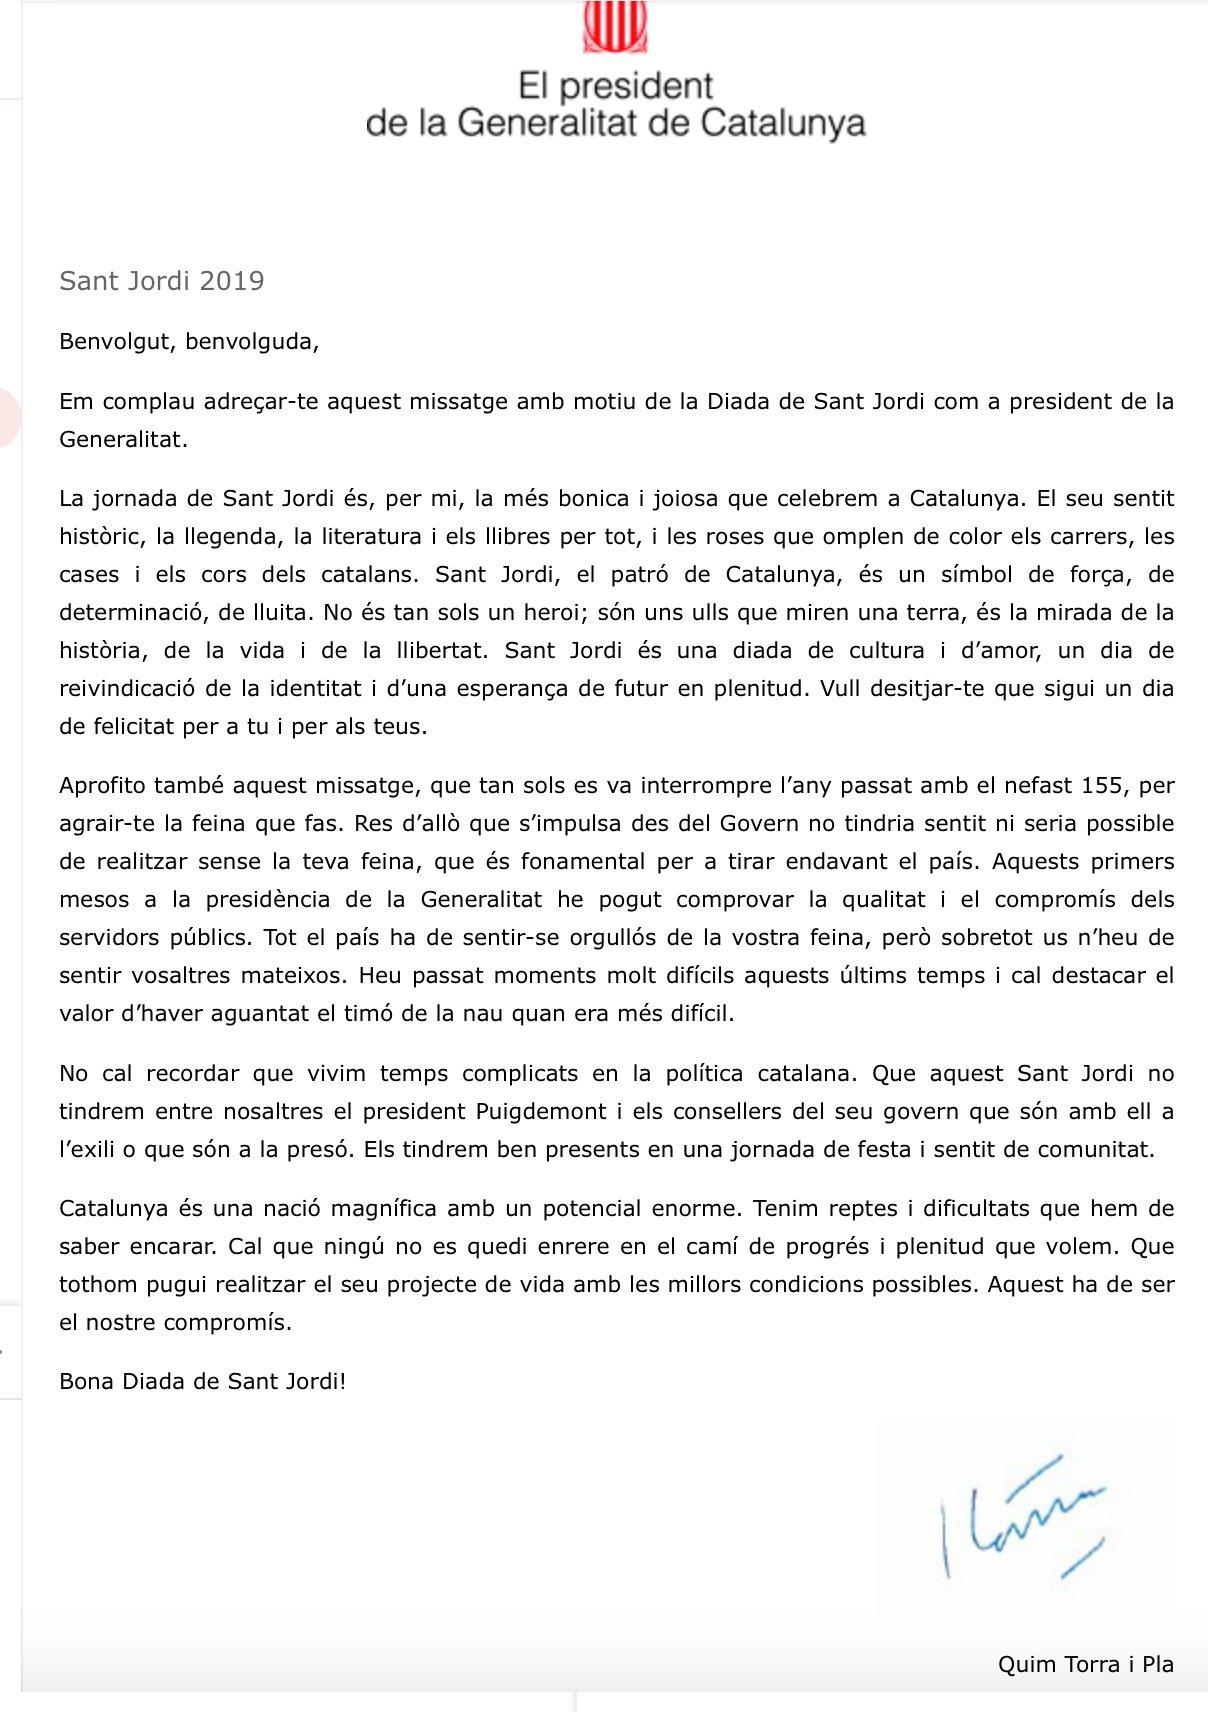 Carta de Quim Torra a los funcionarios por Sant Jordi